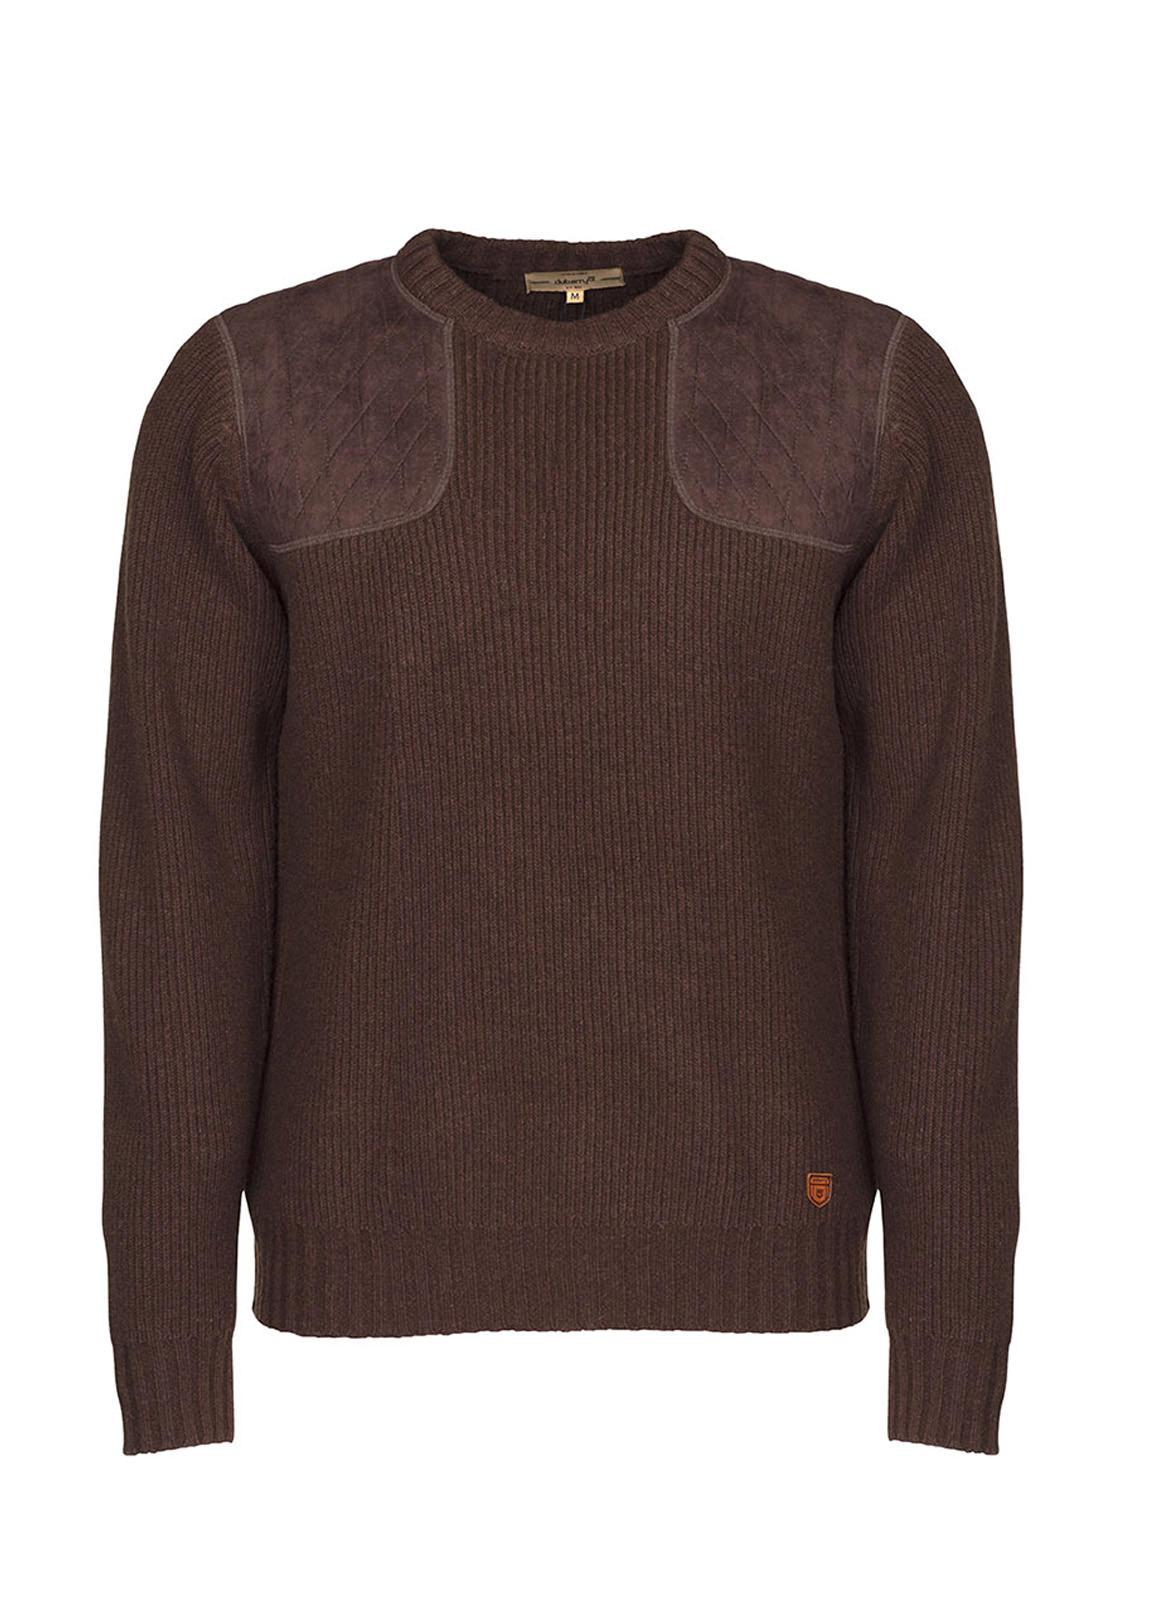 Dubarry_ Mulligan Men's Sweater - Chestnut_Image_2